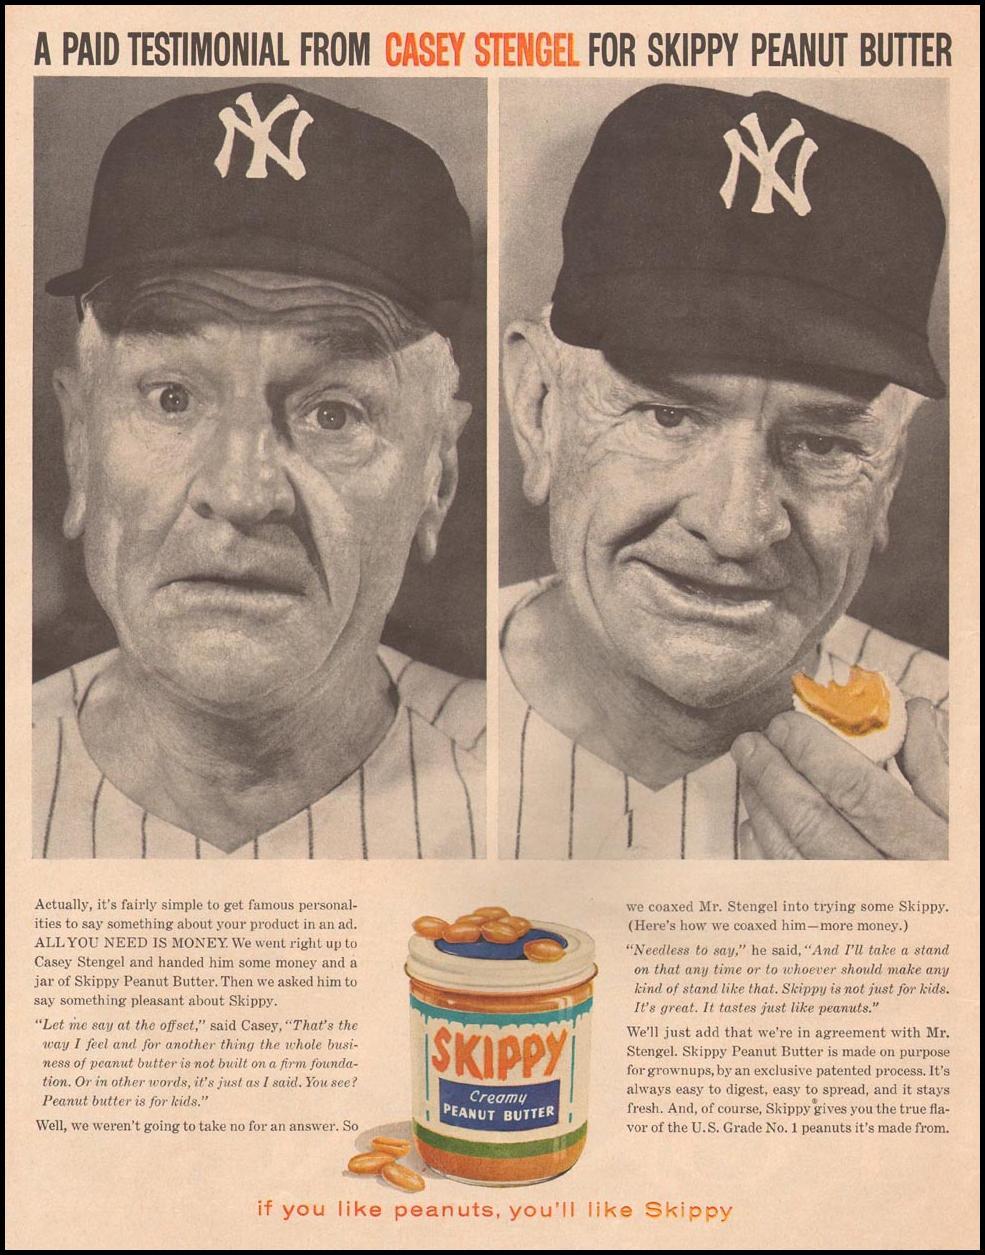 SKIPPY PEANUT BUTTER LIFE 10/05/1959